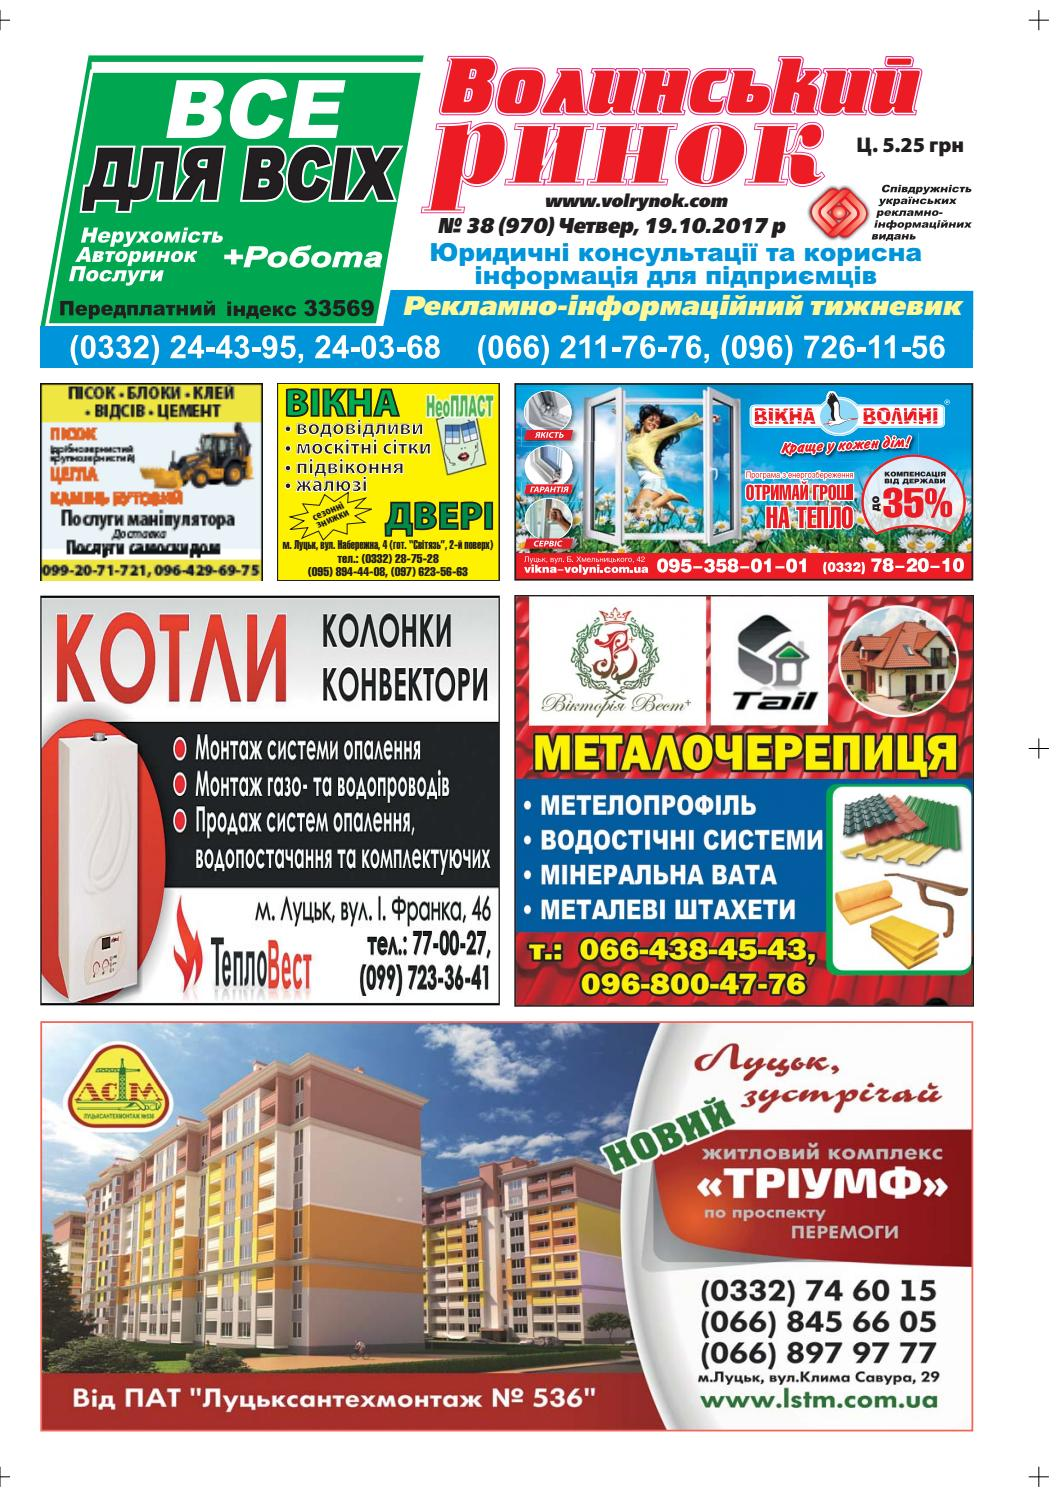 №38 19 10 2017 by volrynok - issuu cfb455f961e4d